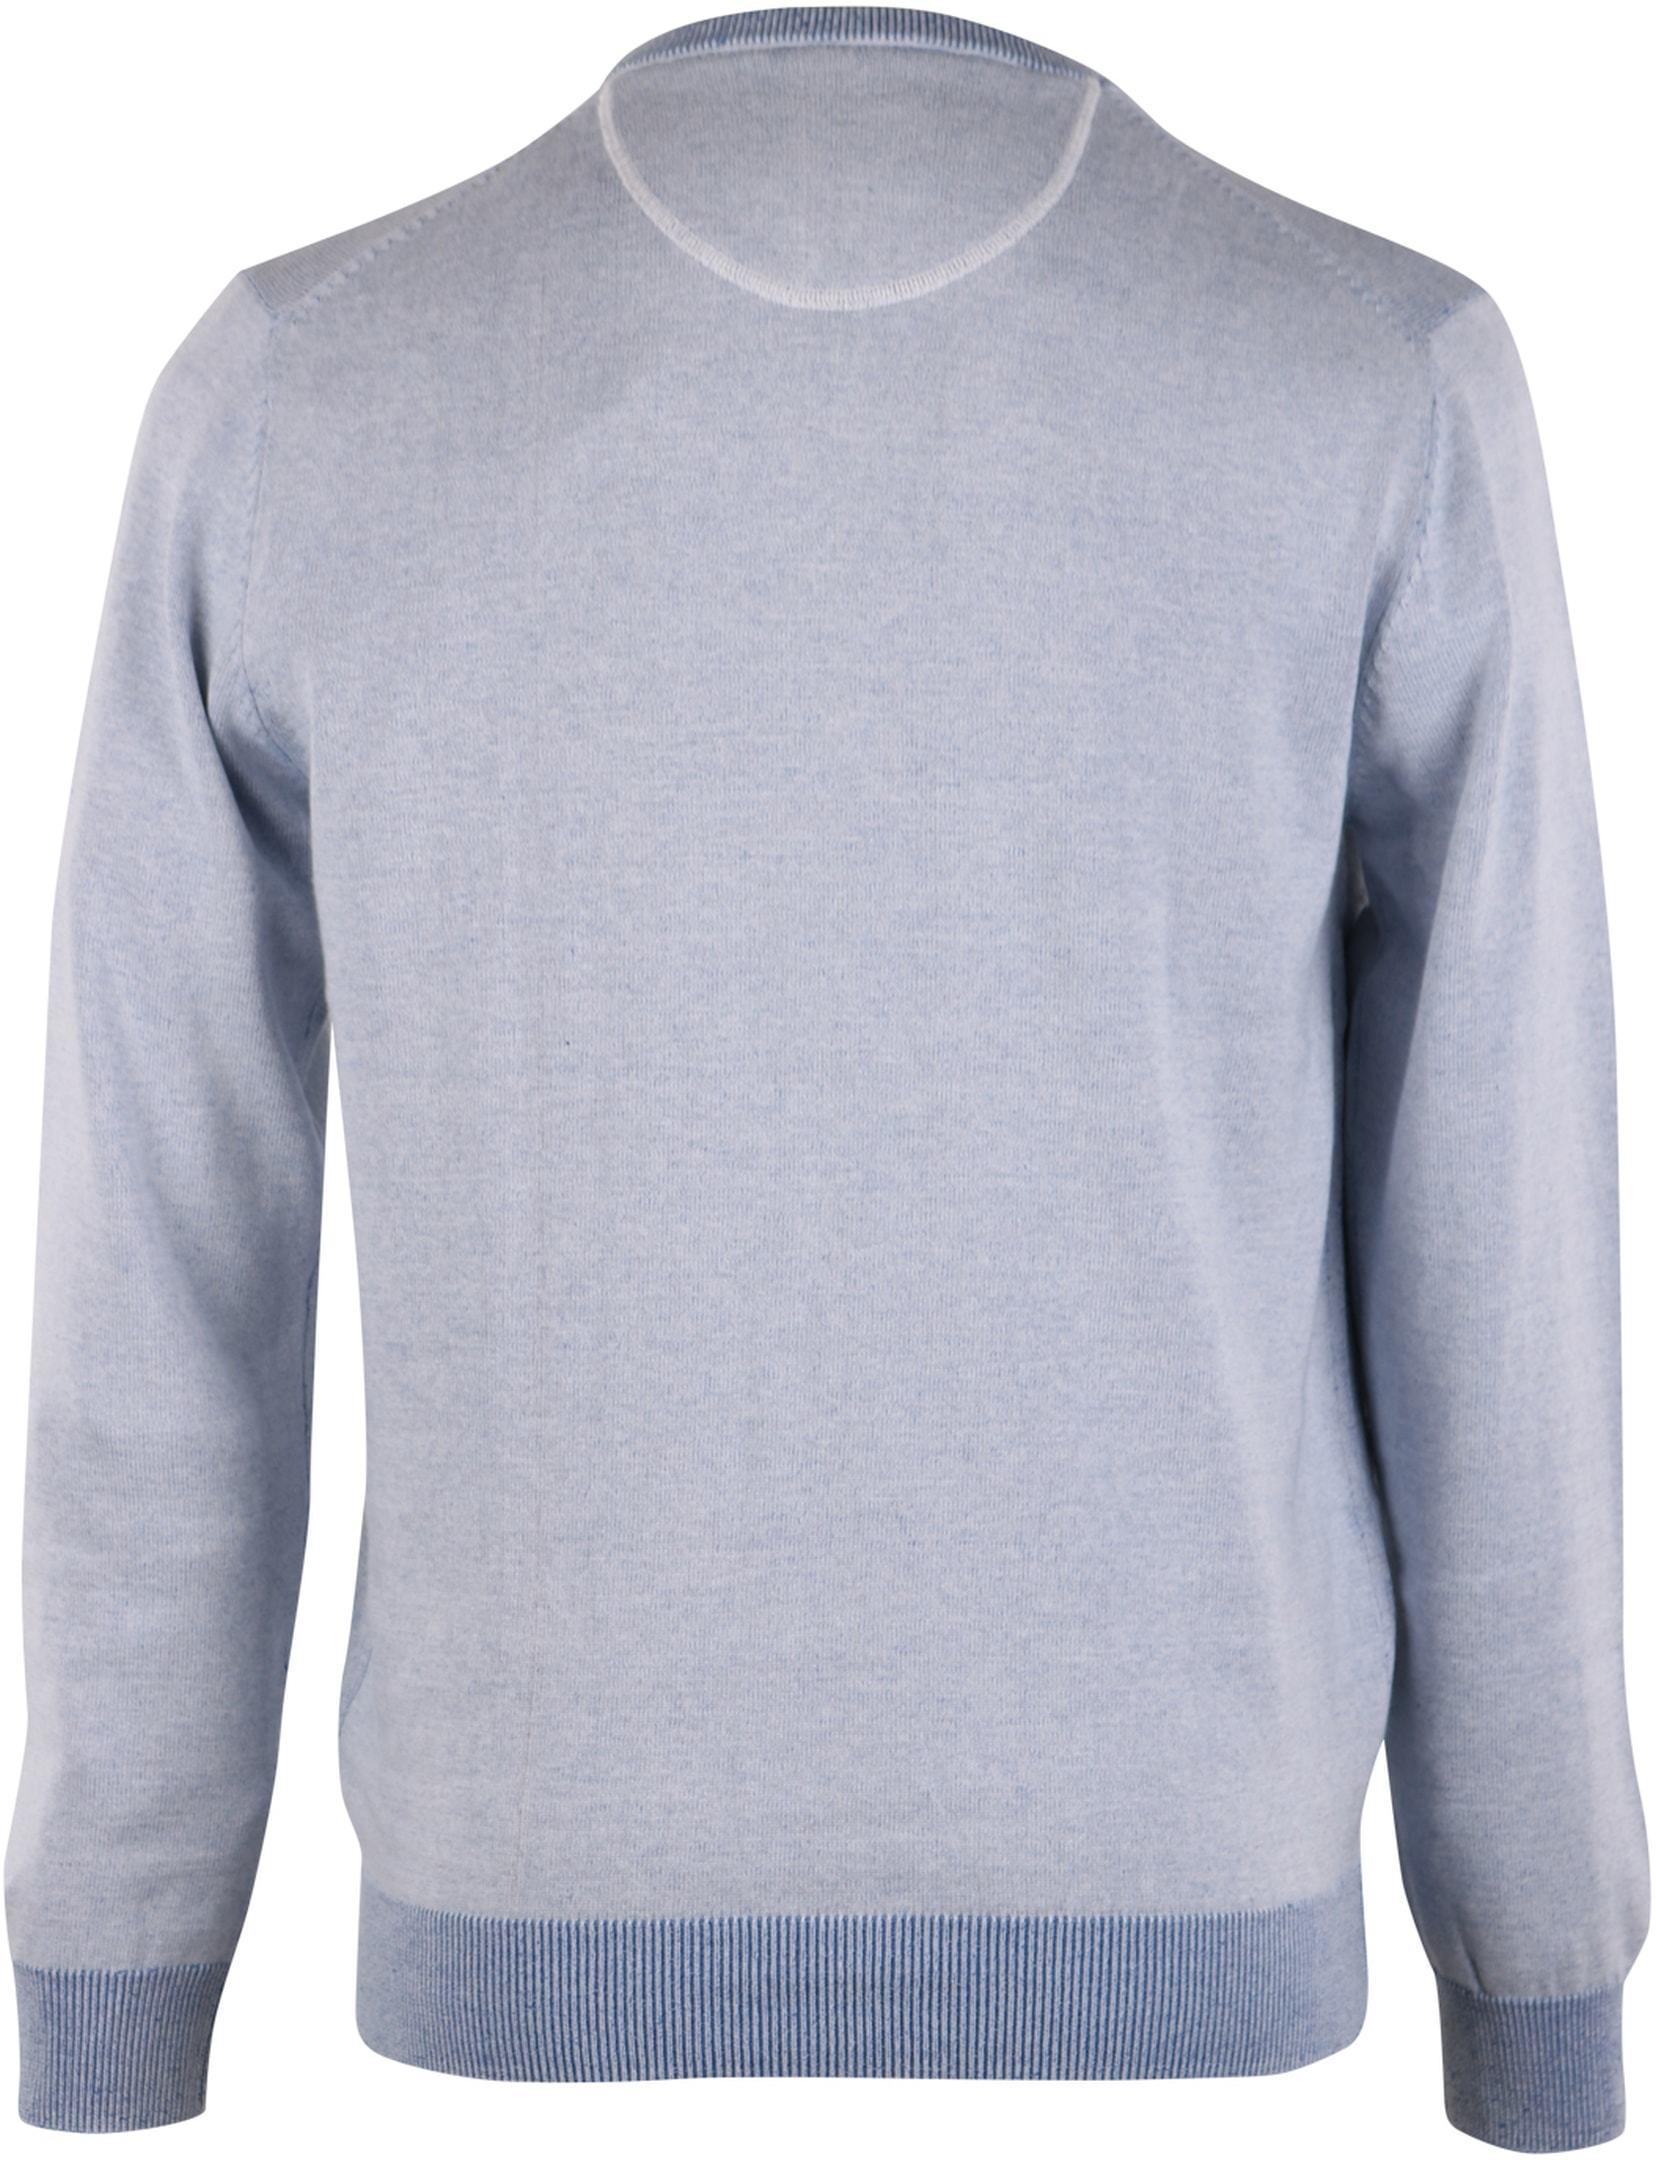 Pullover O-Hals Blauw foto 1